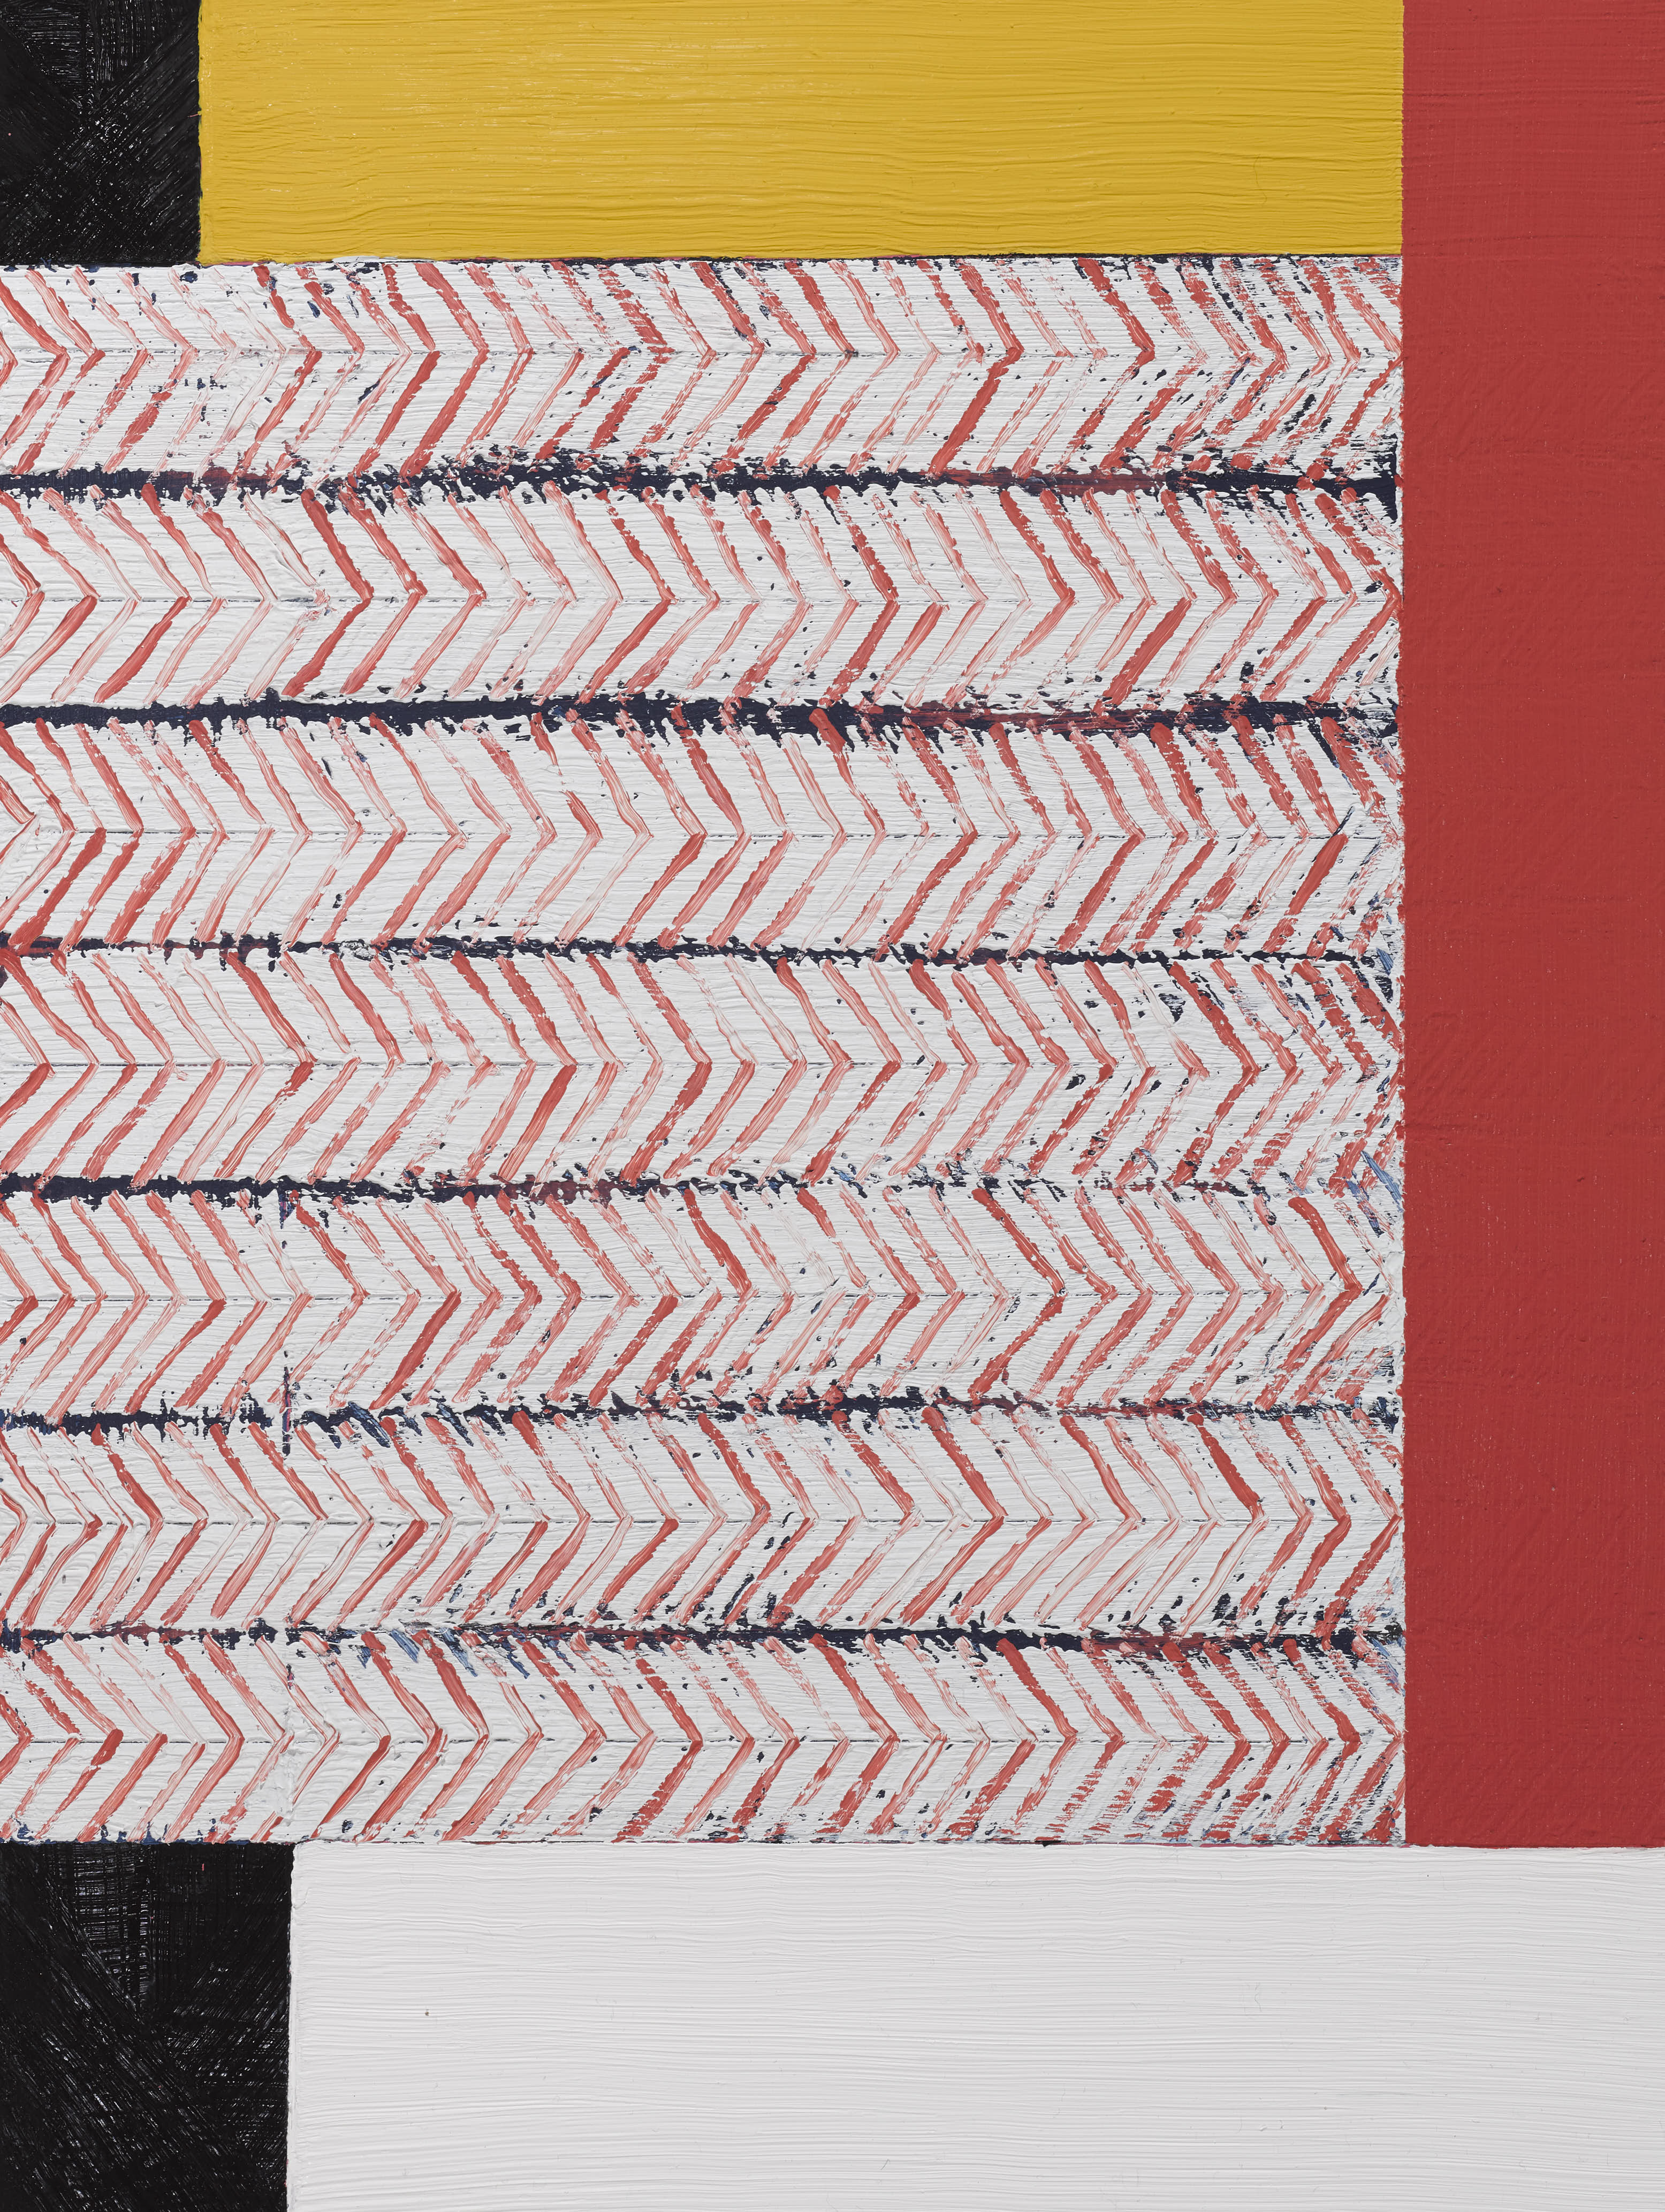 John Noel Smith: Passage, (20.15), 2020. Oil On Board, 40x30cm | John Noel Smith: Passage | Thursday 12 August – Saturday 11 September 2021 | Hillsboro Fine Art